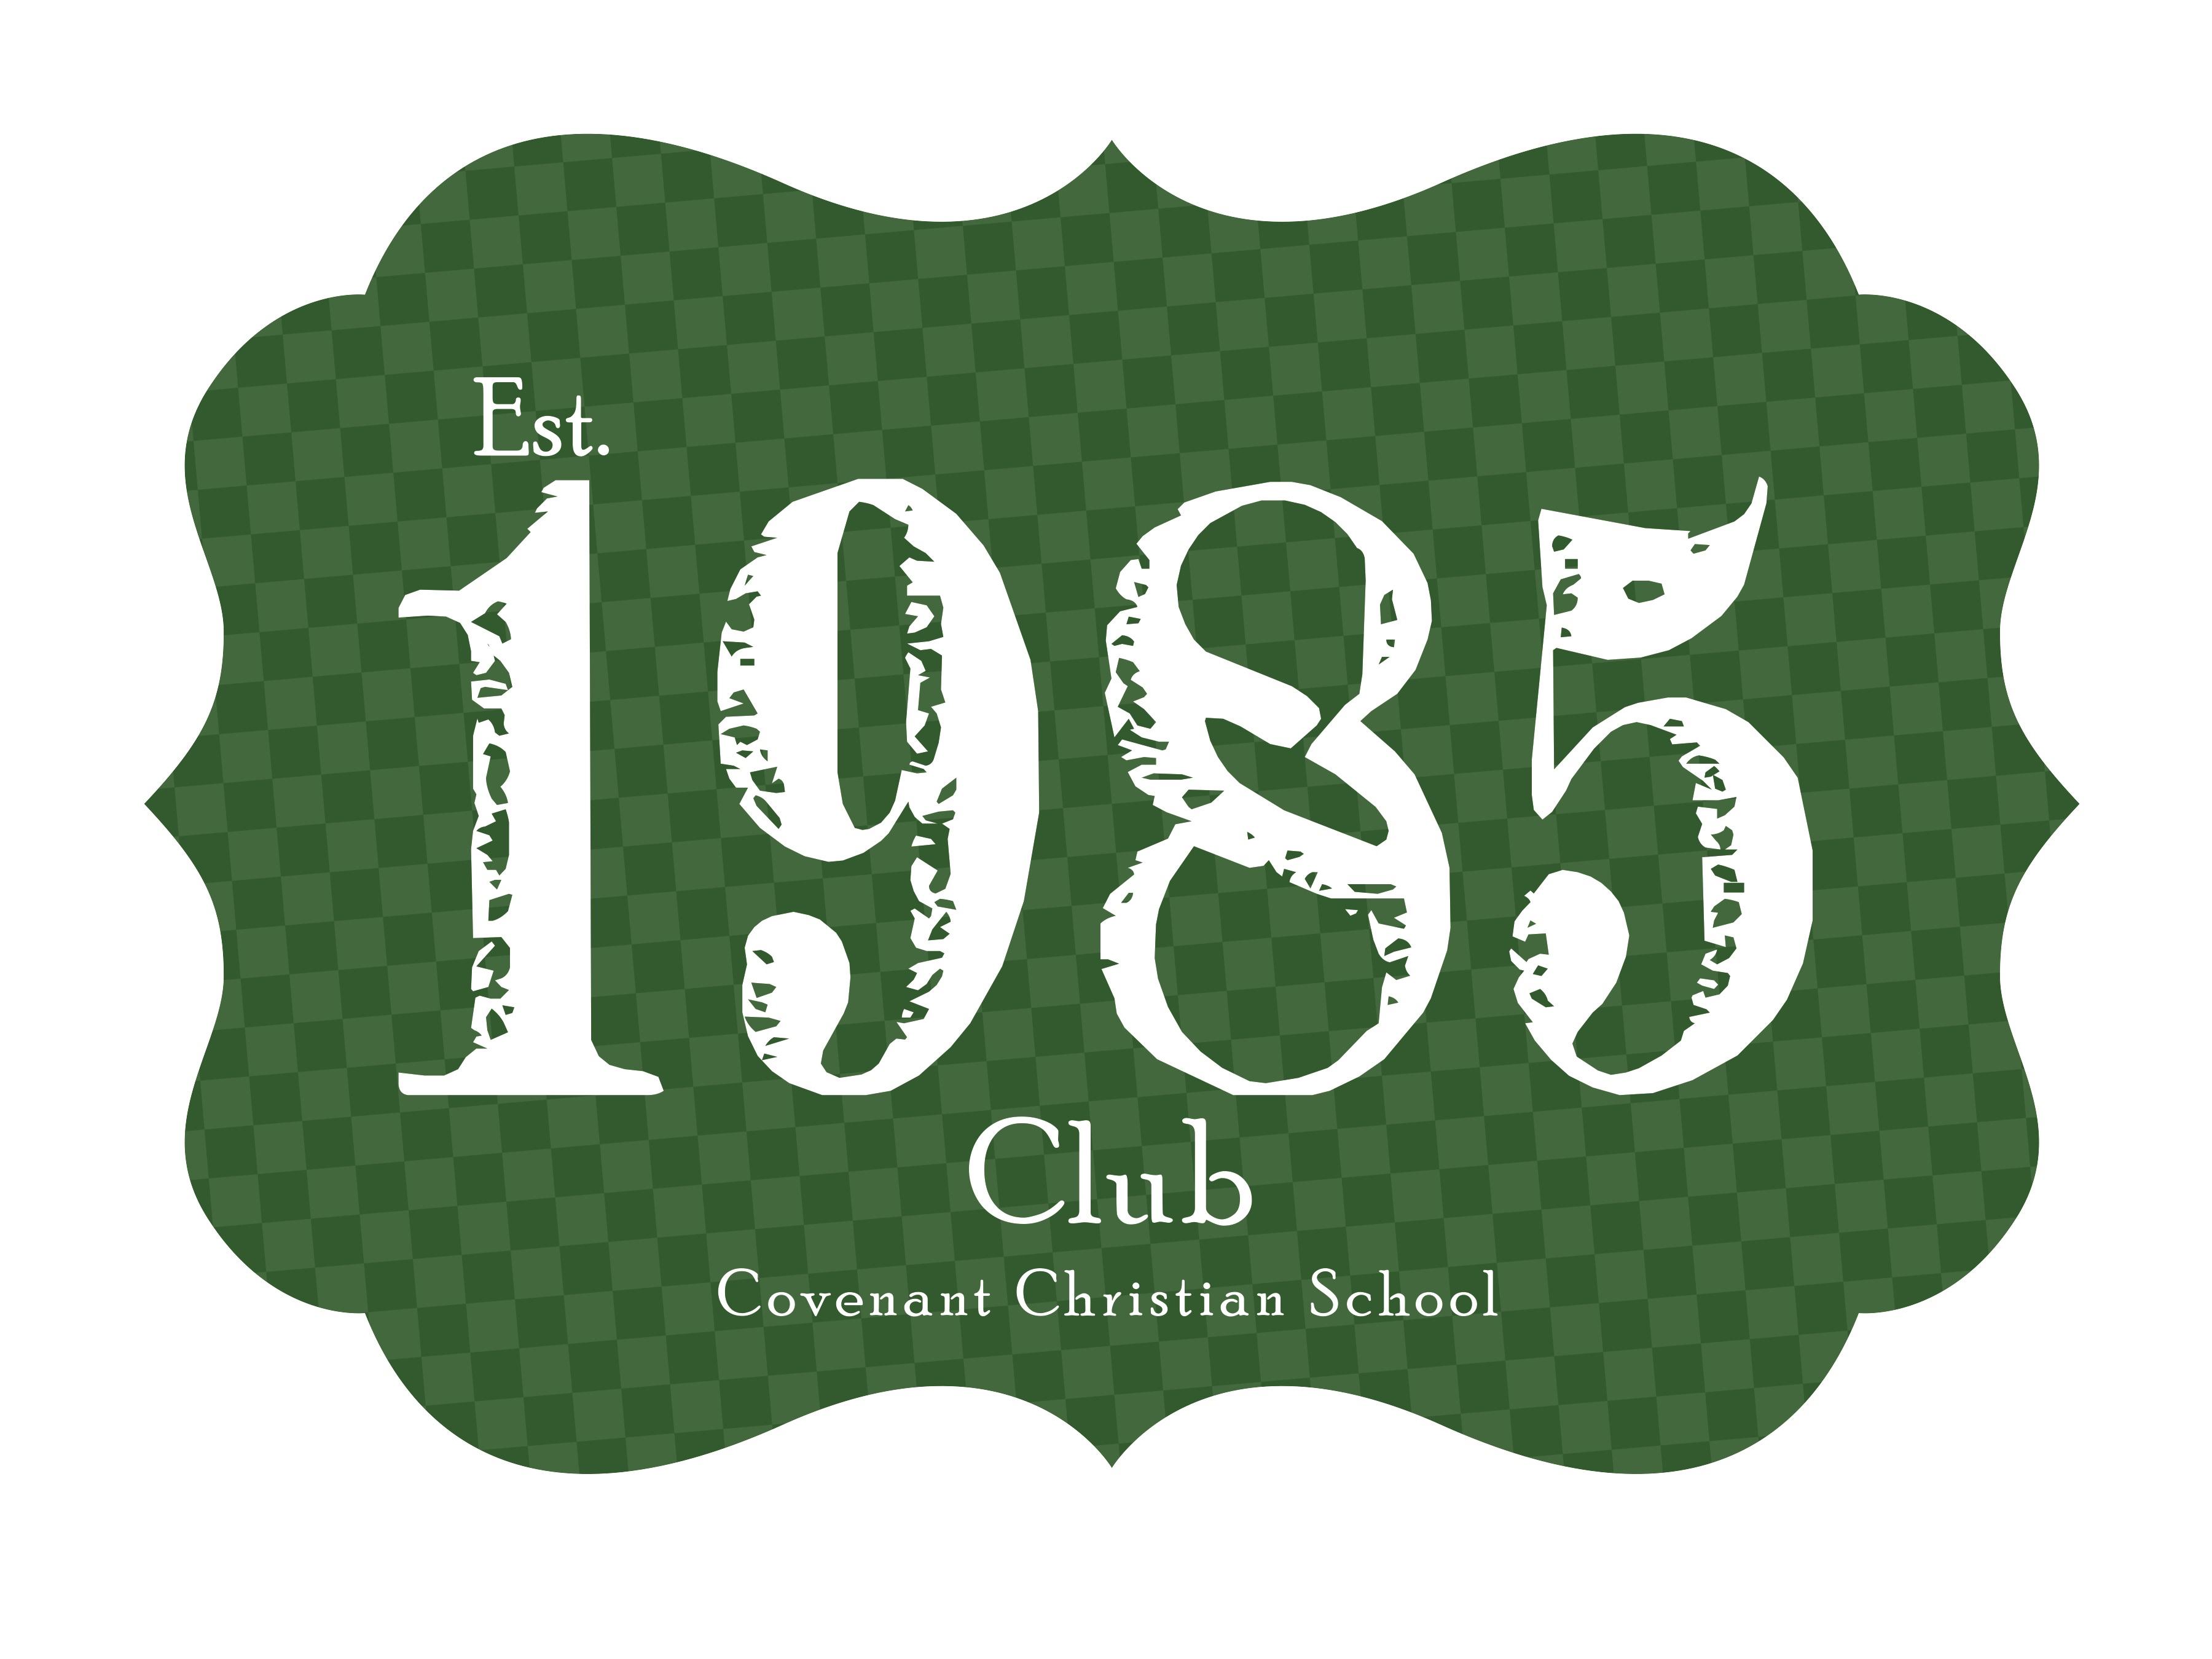 the 1985 Club